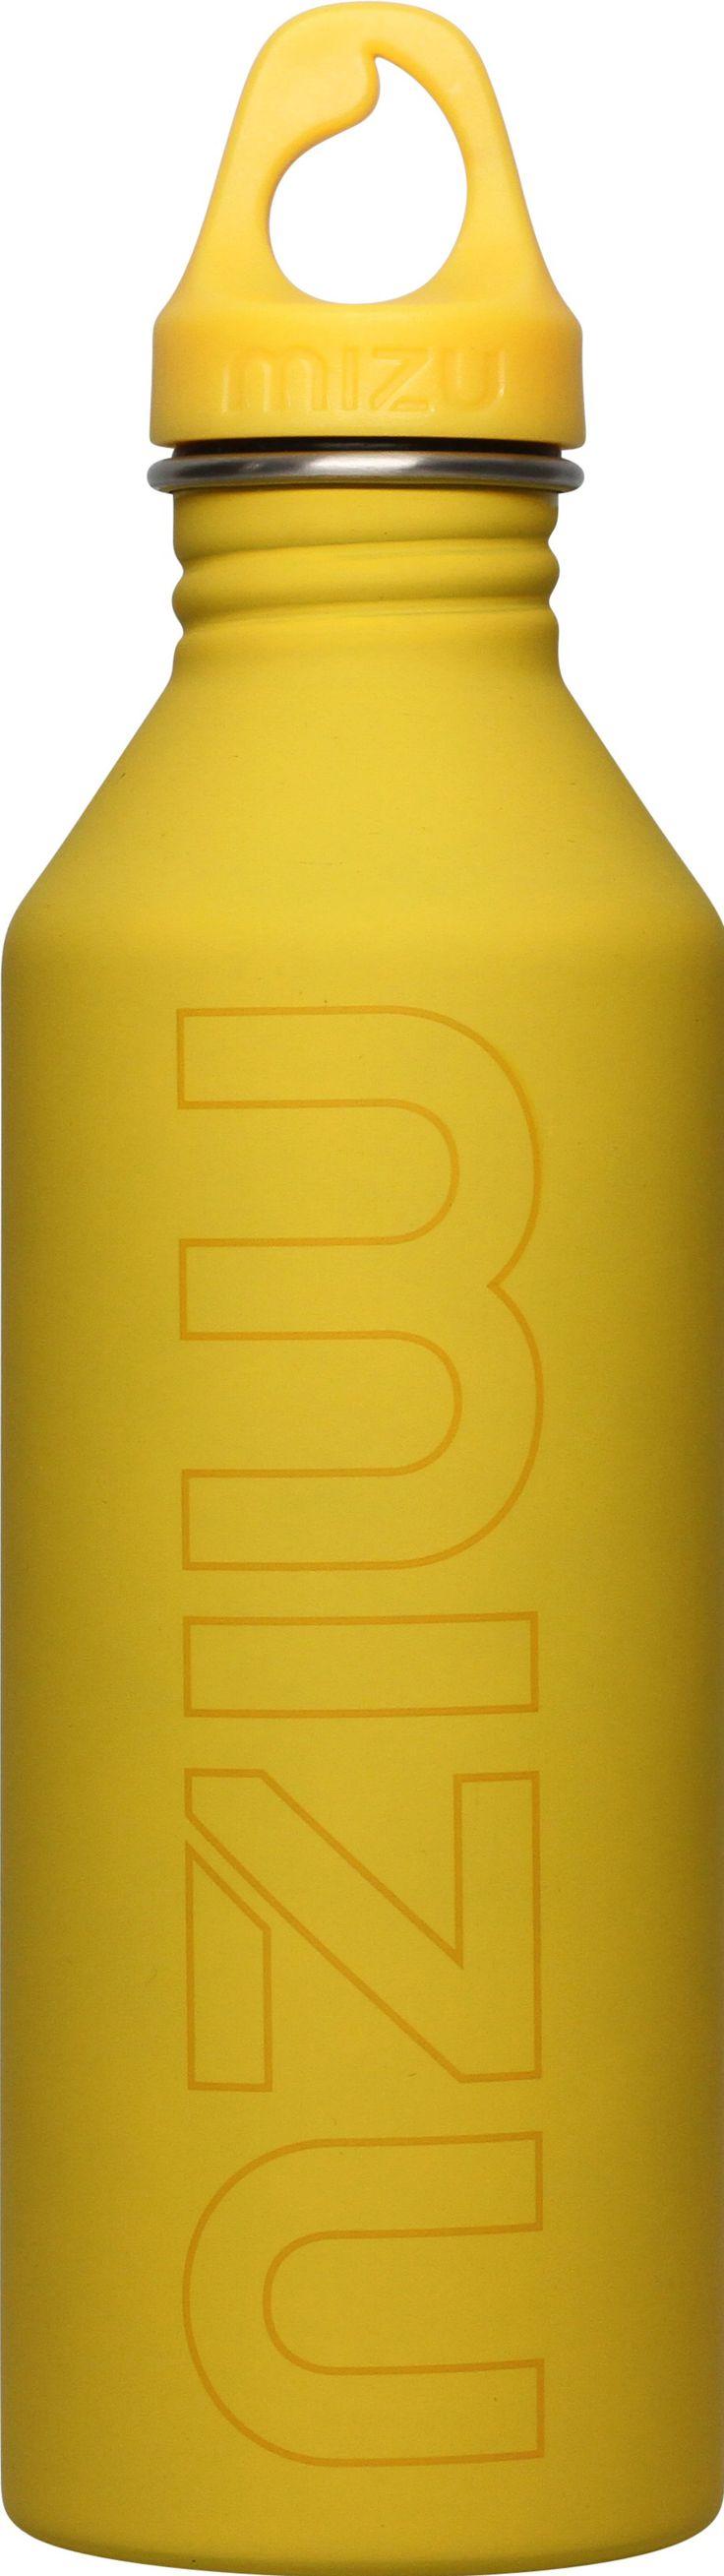 Mizu bottle yellow